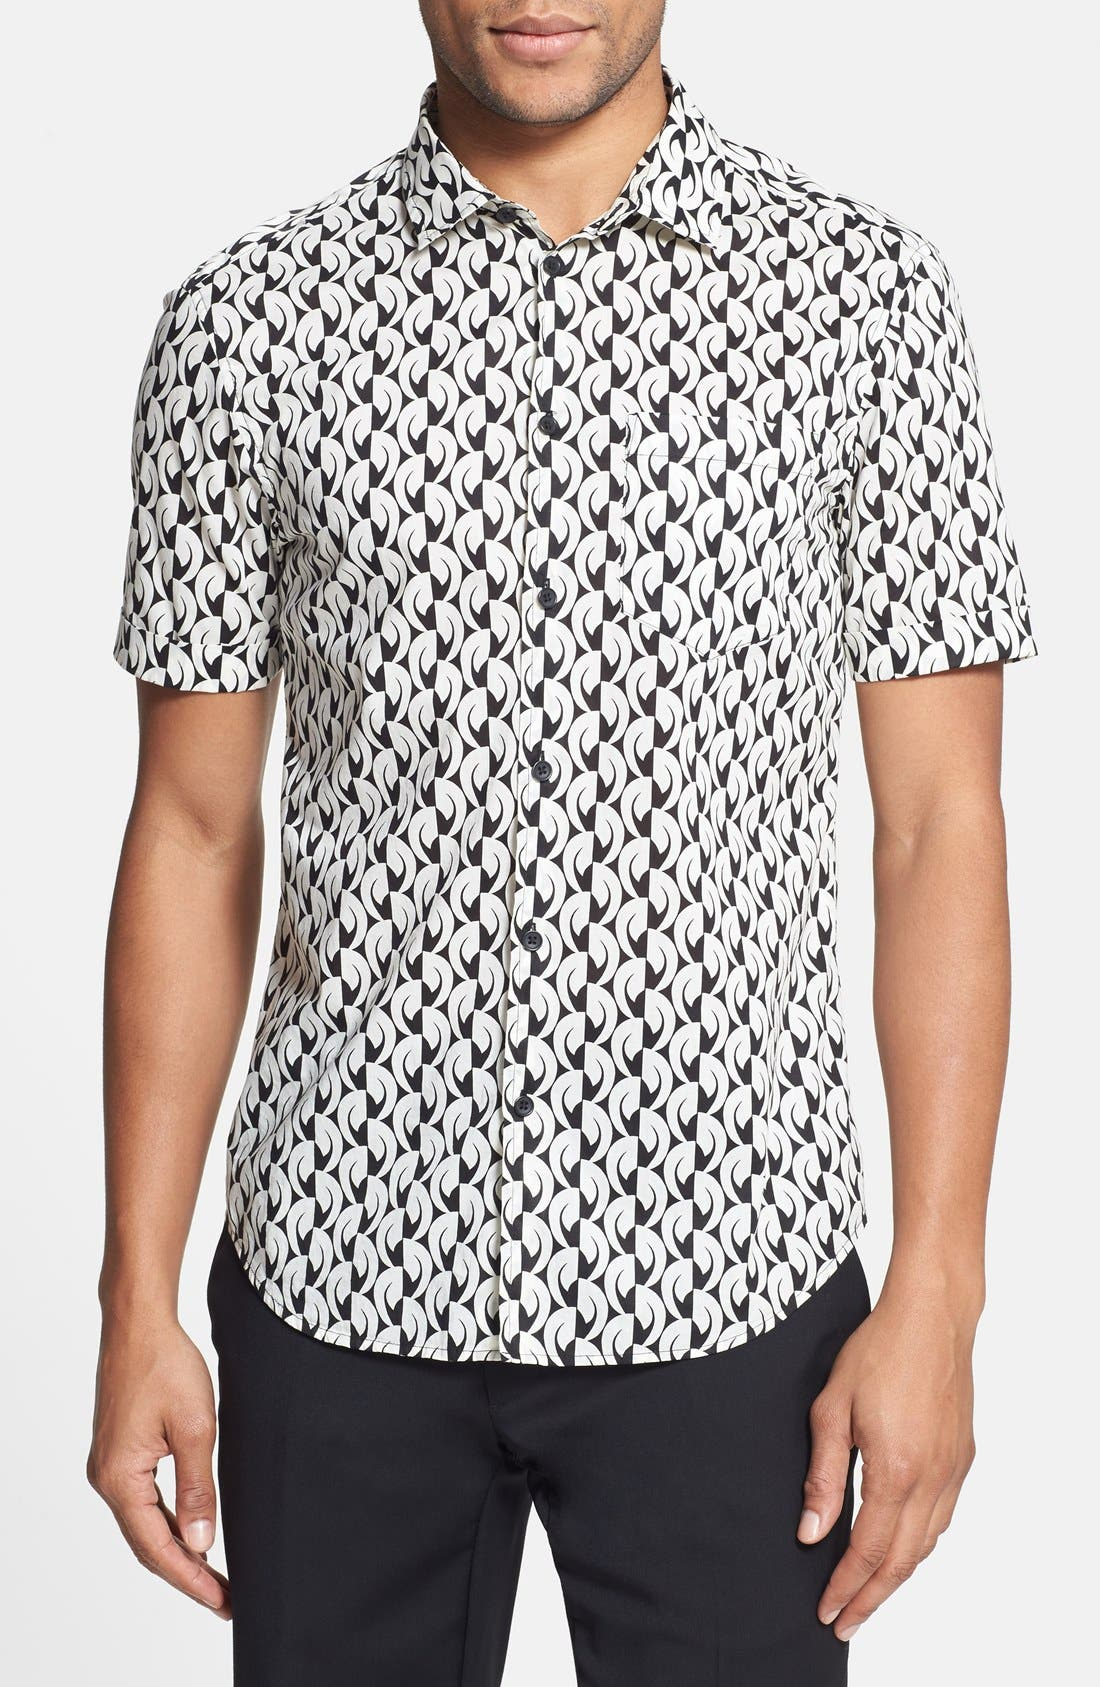 Main Image - MARC BY MARC JACOBS 'Bellflower' Print Short Sleeve Sport Shirt